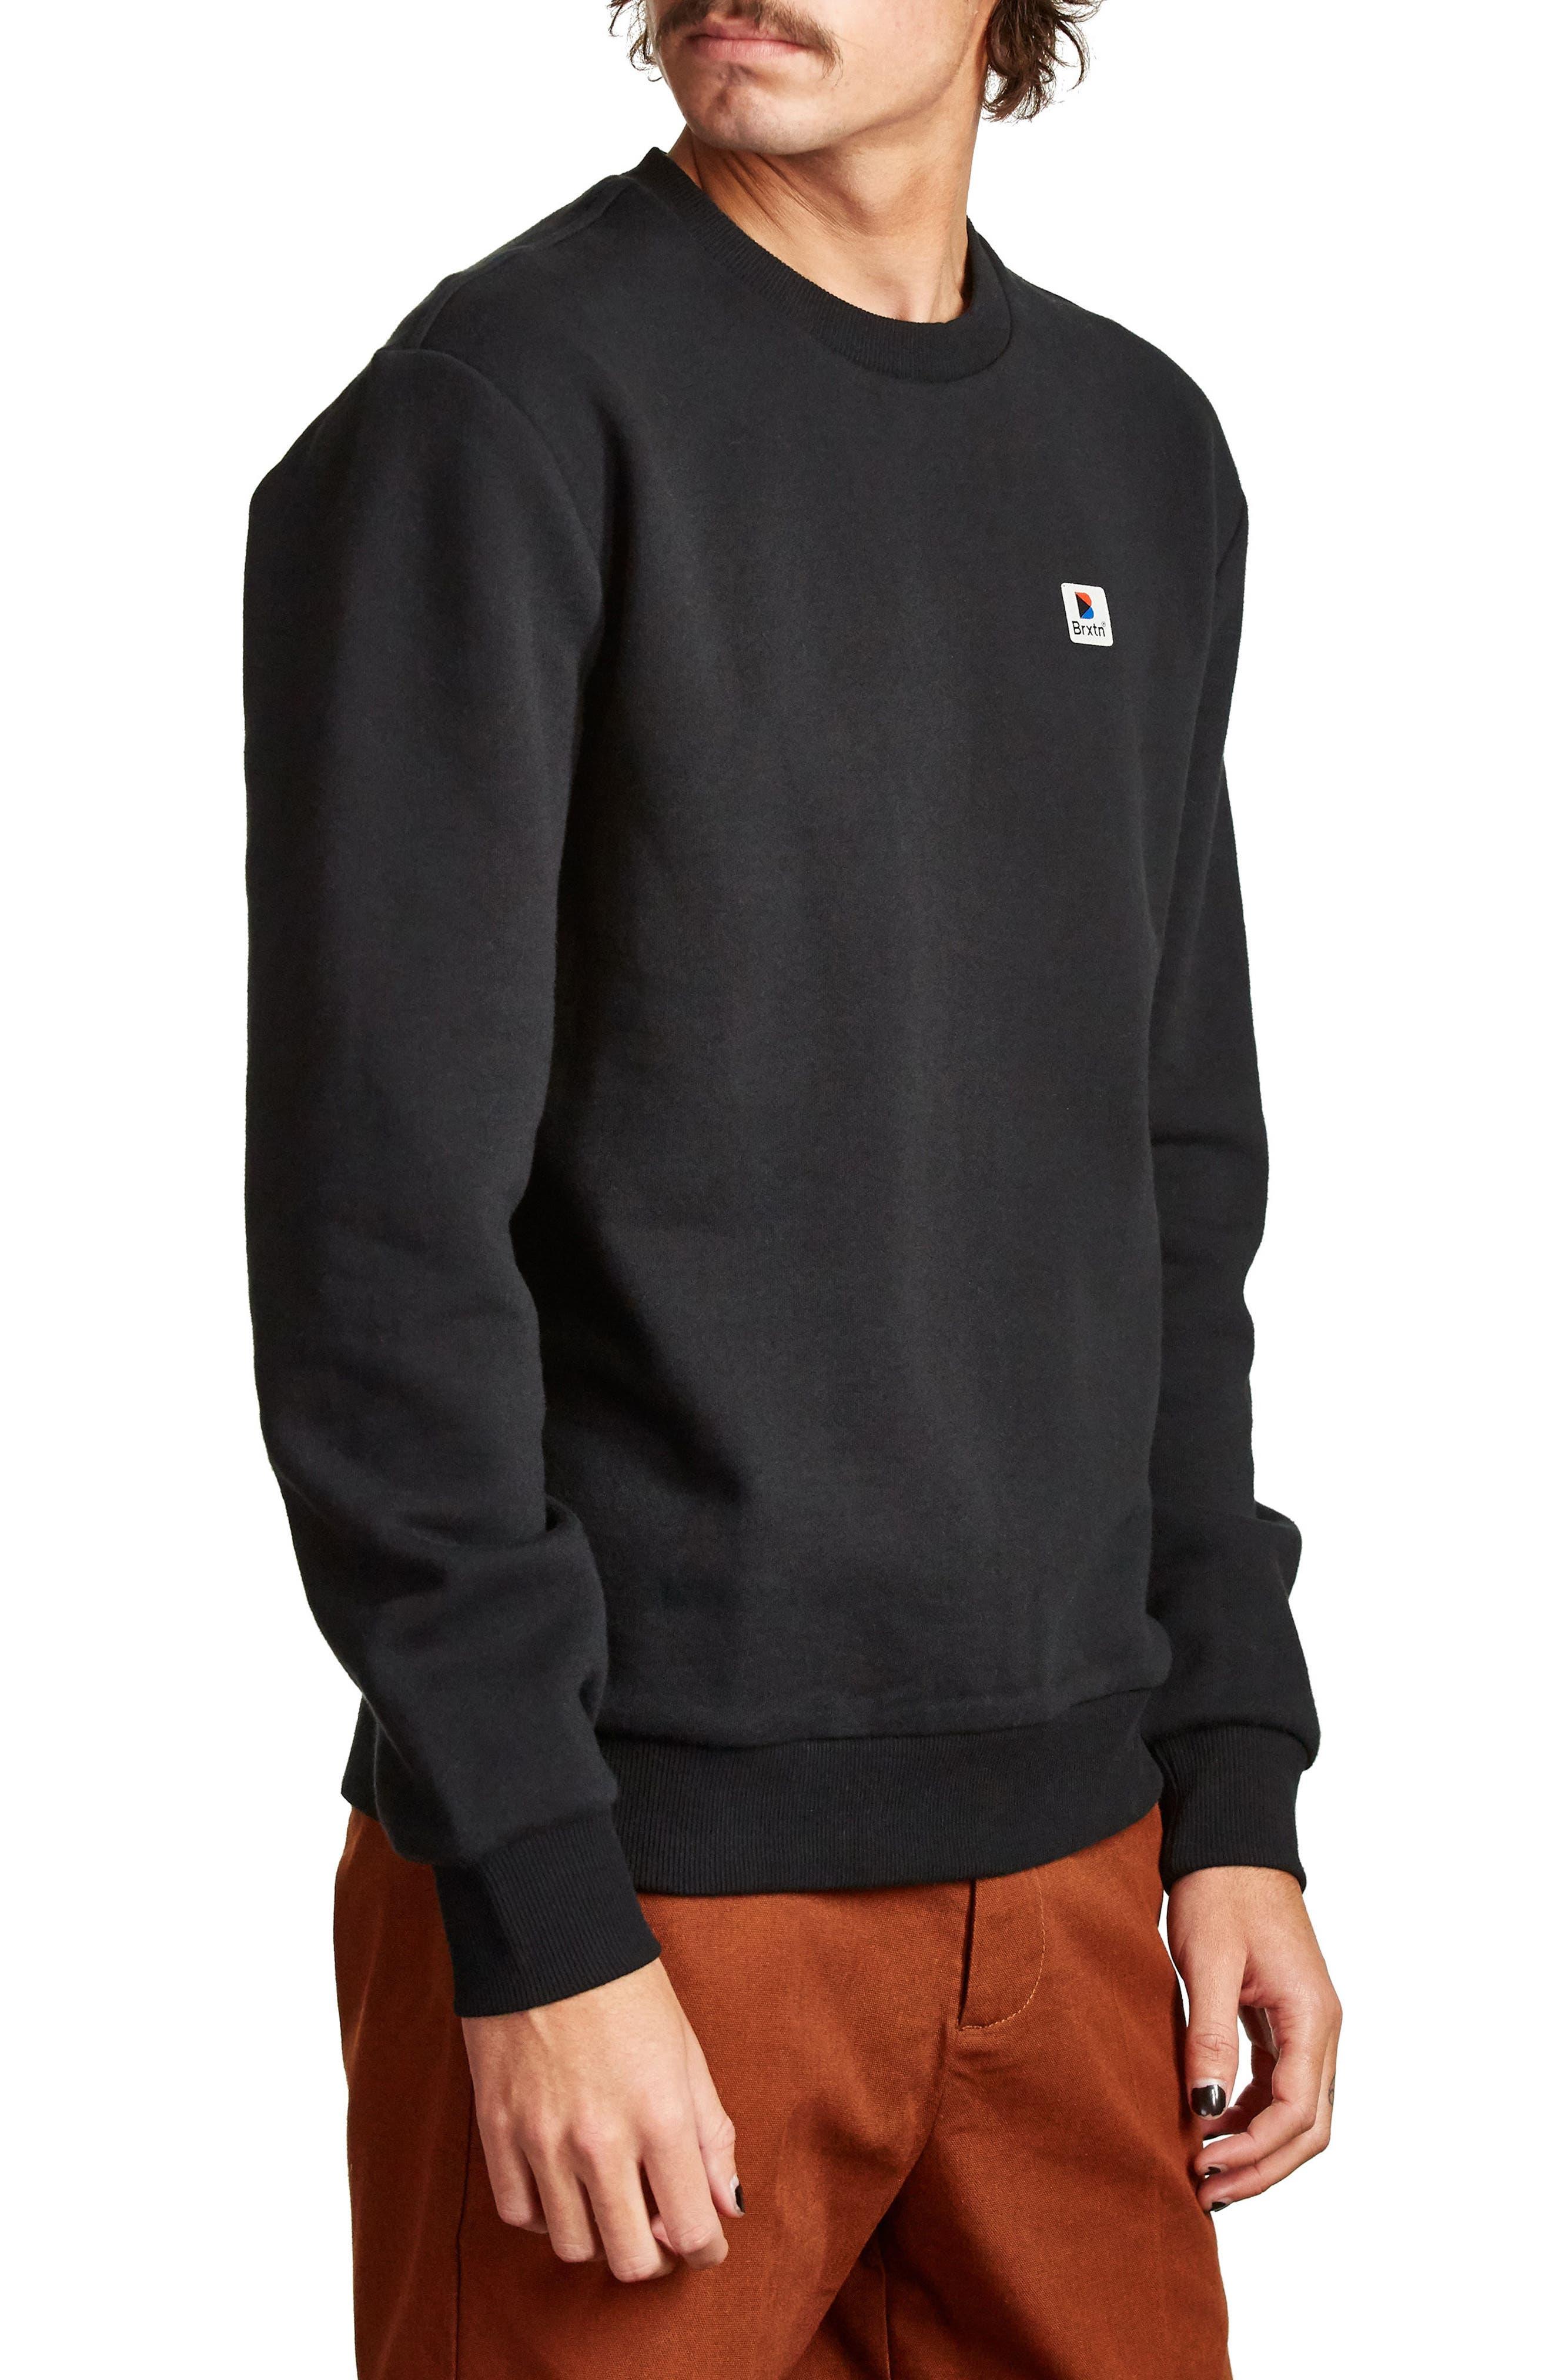 Stonewell Sweatshirt,                             Alternate thumbnail 3, color,                             Black